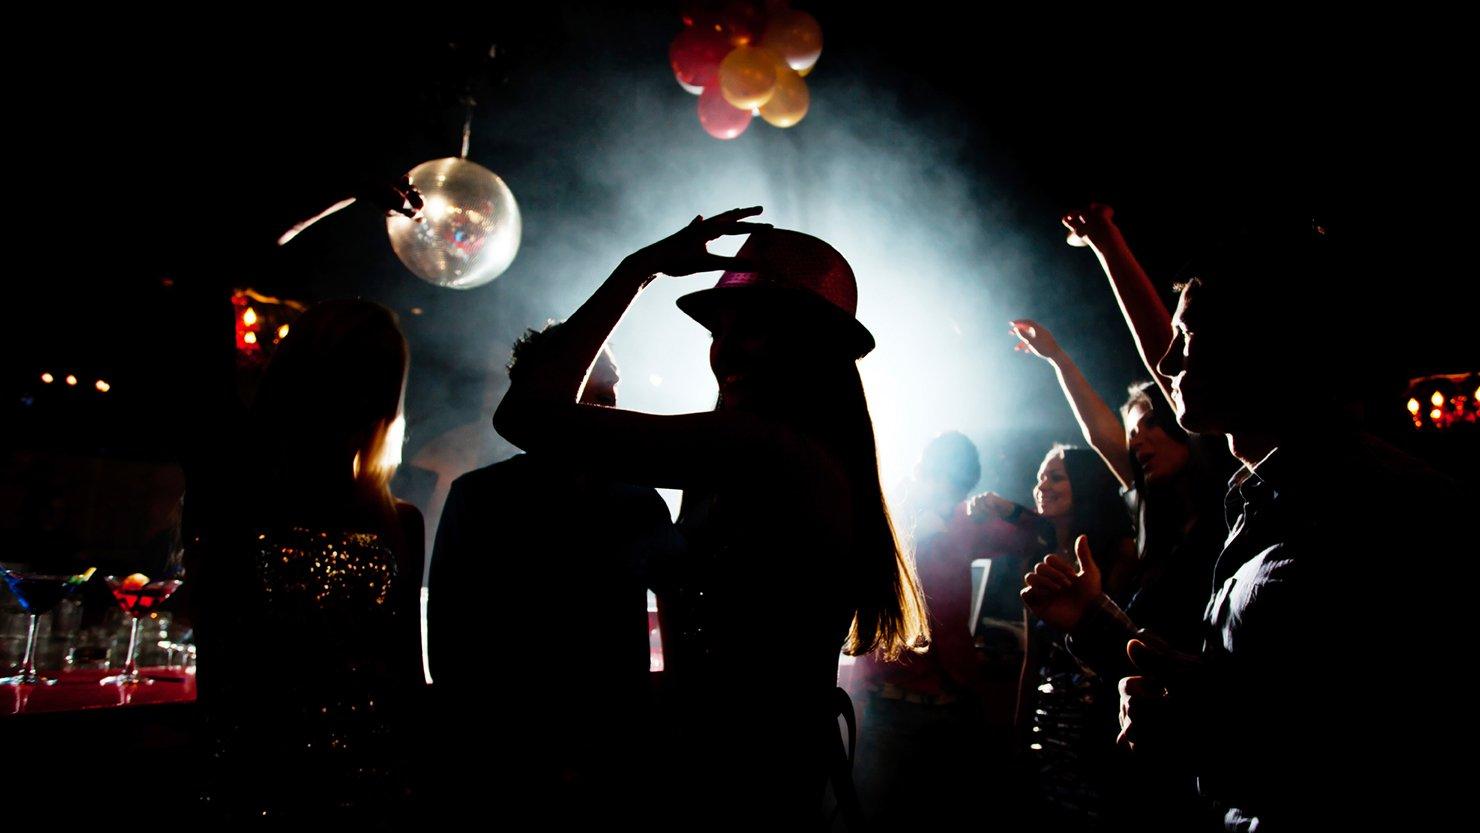 CHAUVET DJ LED Lighting (MINI STROBE LED) by CHAUVET DJ